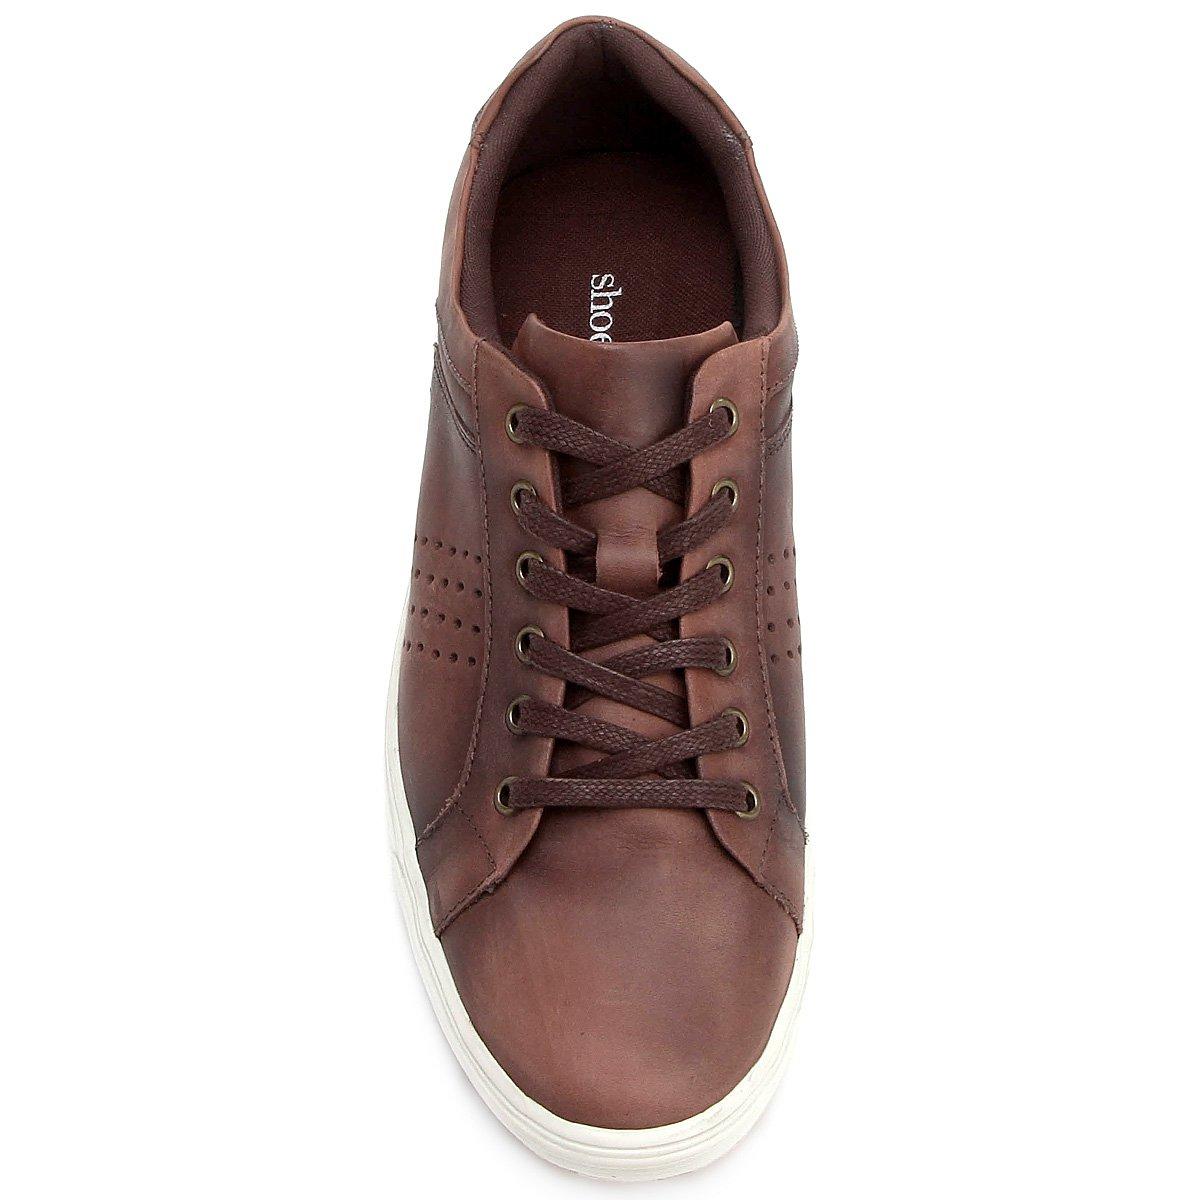 139f201da8 Sapatênis Couro Shoestock Perfuros Masculino - Compre Agora